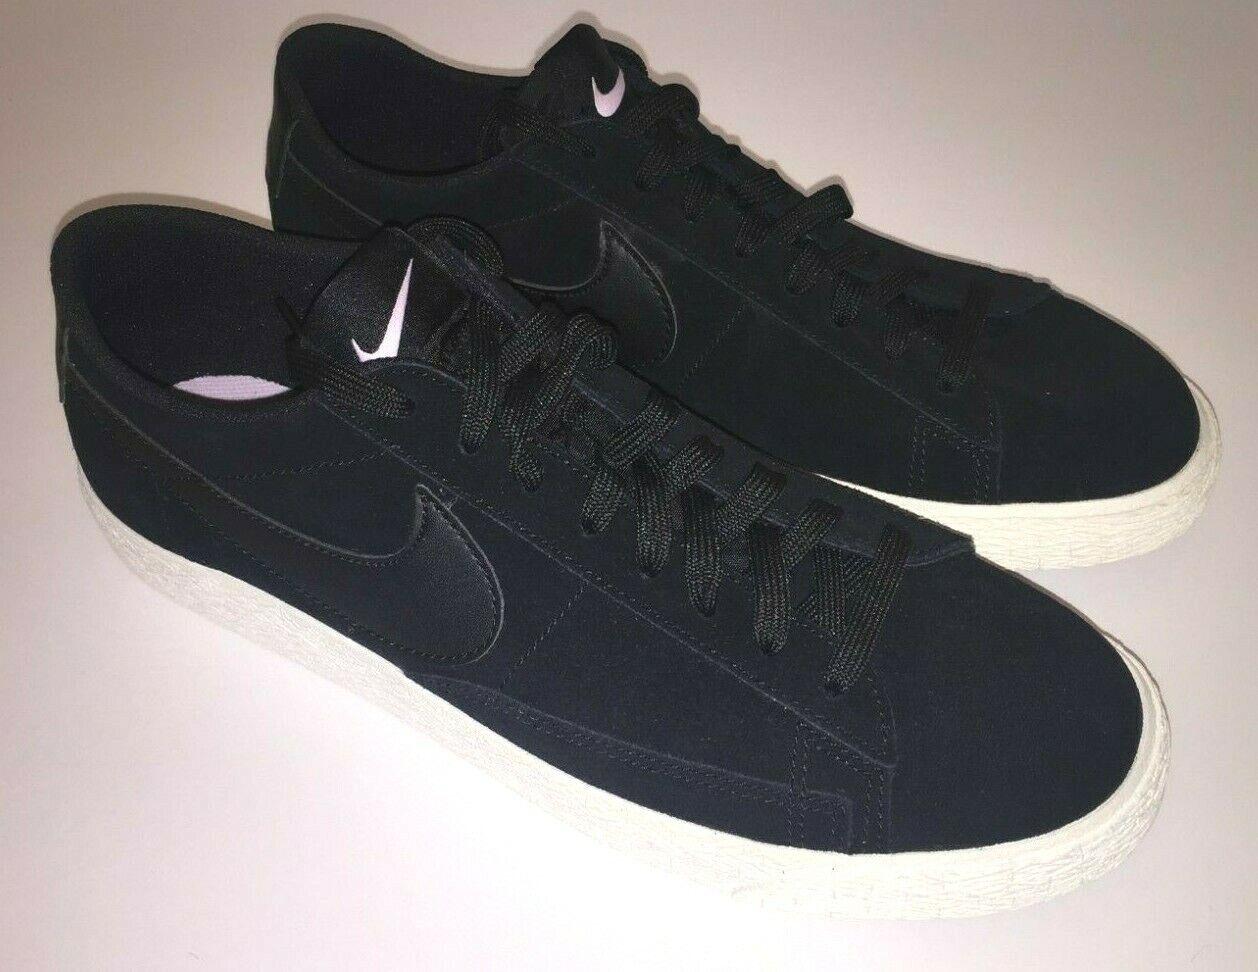 Nike SB Zoom Blazer Low GT Black Skate Shoes Suede 371760 02